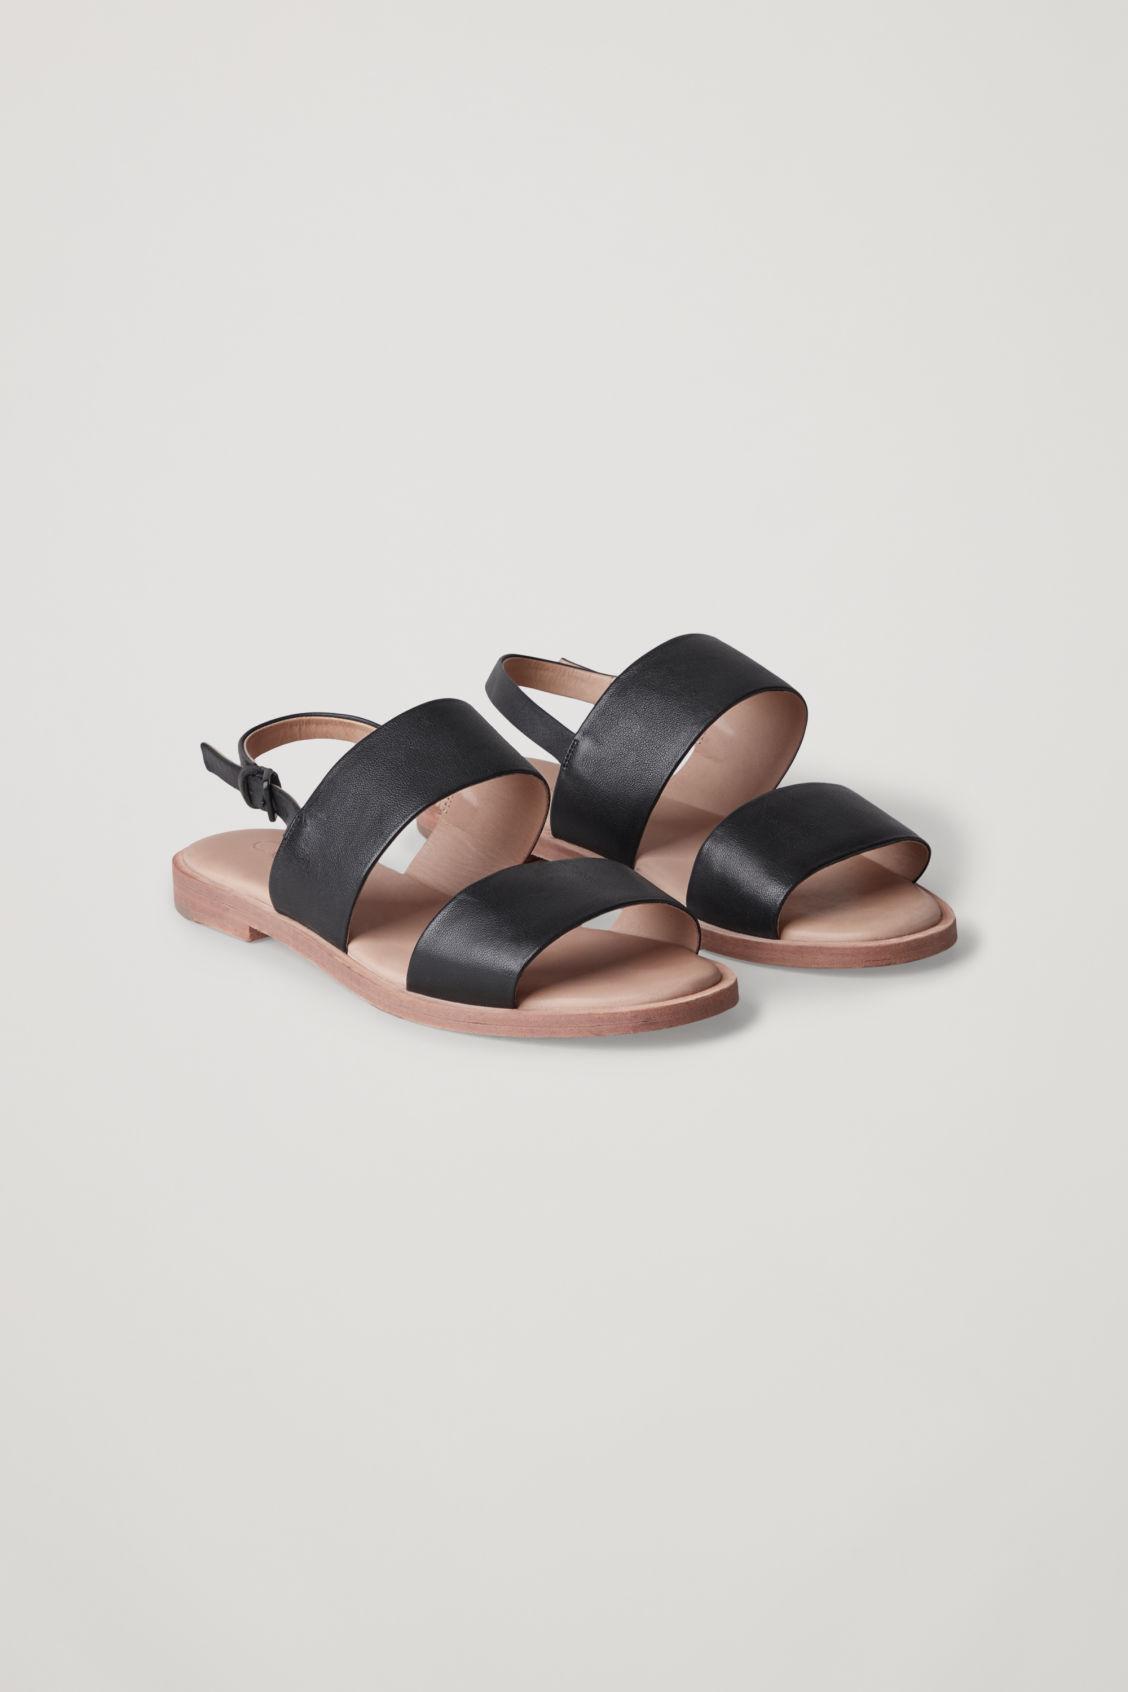 c535c5af642a1 Front image of Cos leather strap sandals in black